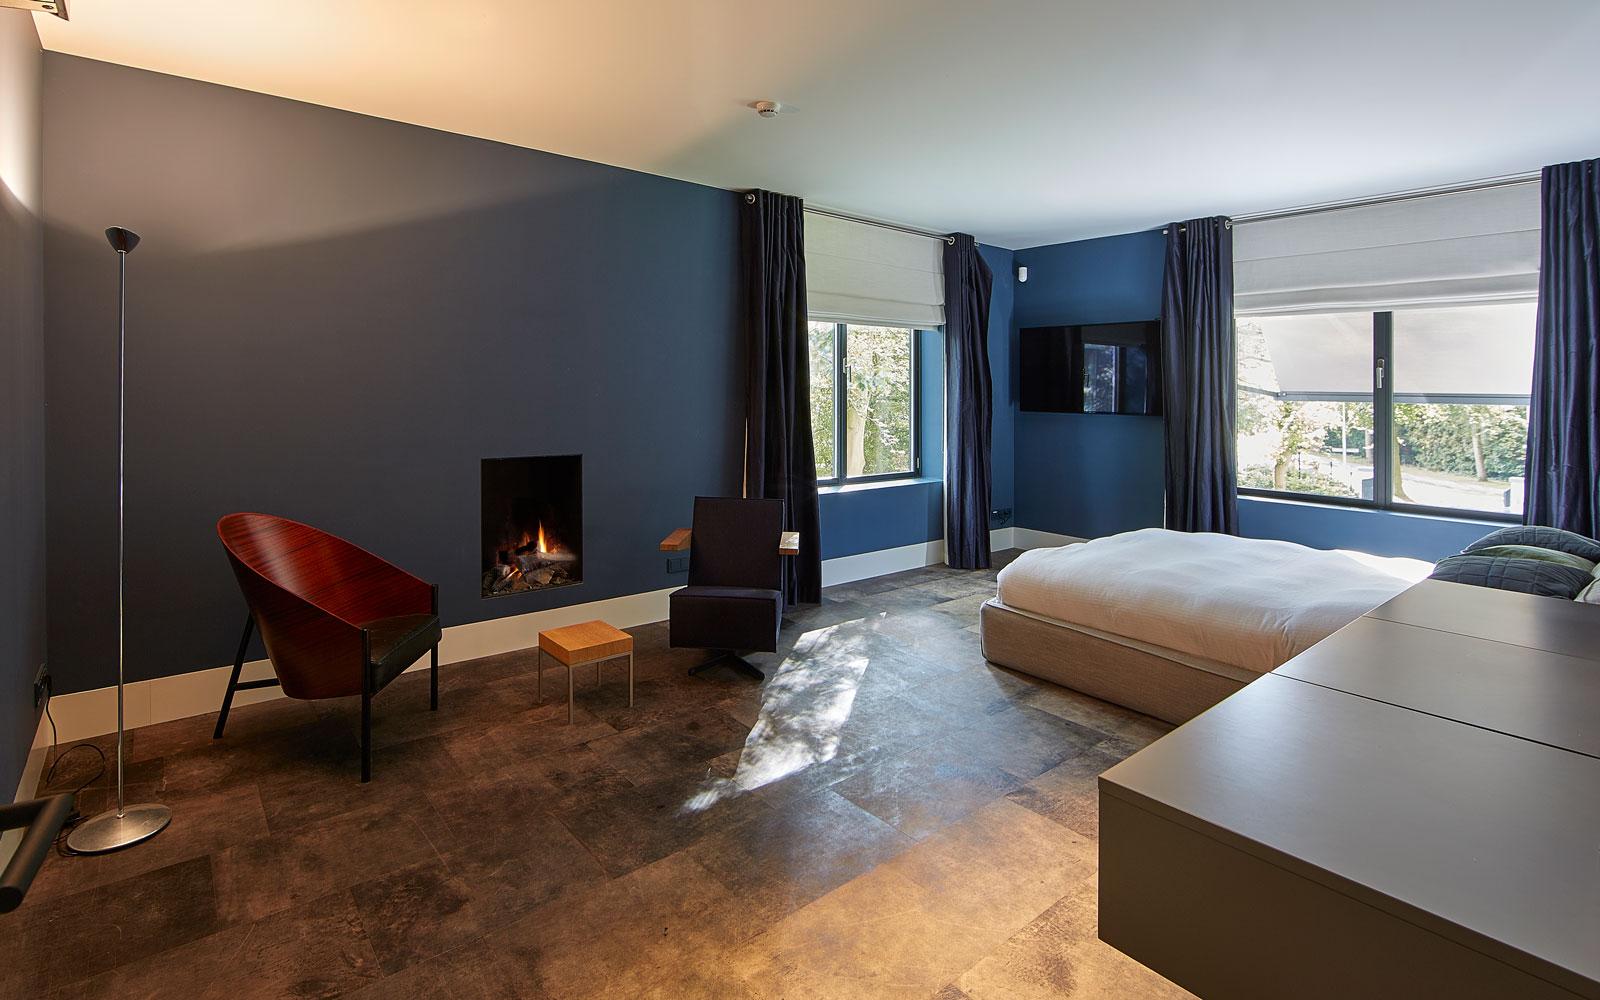 Bovenverdieping, slaapkamer, vloer, leer, Alphenberg Leather, sfeervol, haard, bed, symmetrische villa, PBV Architects